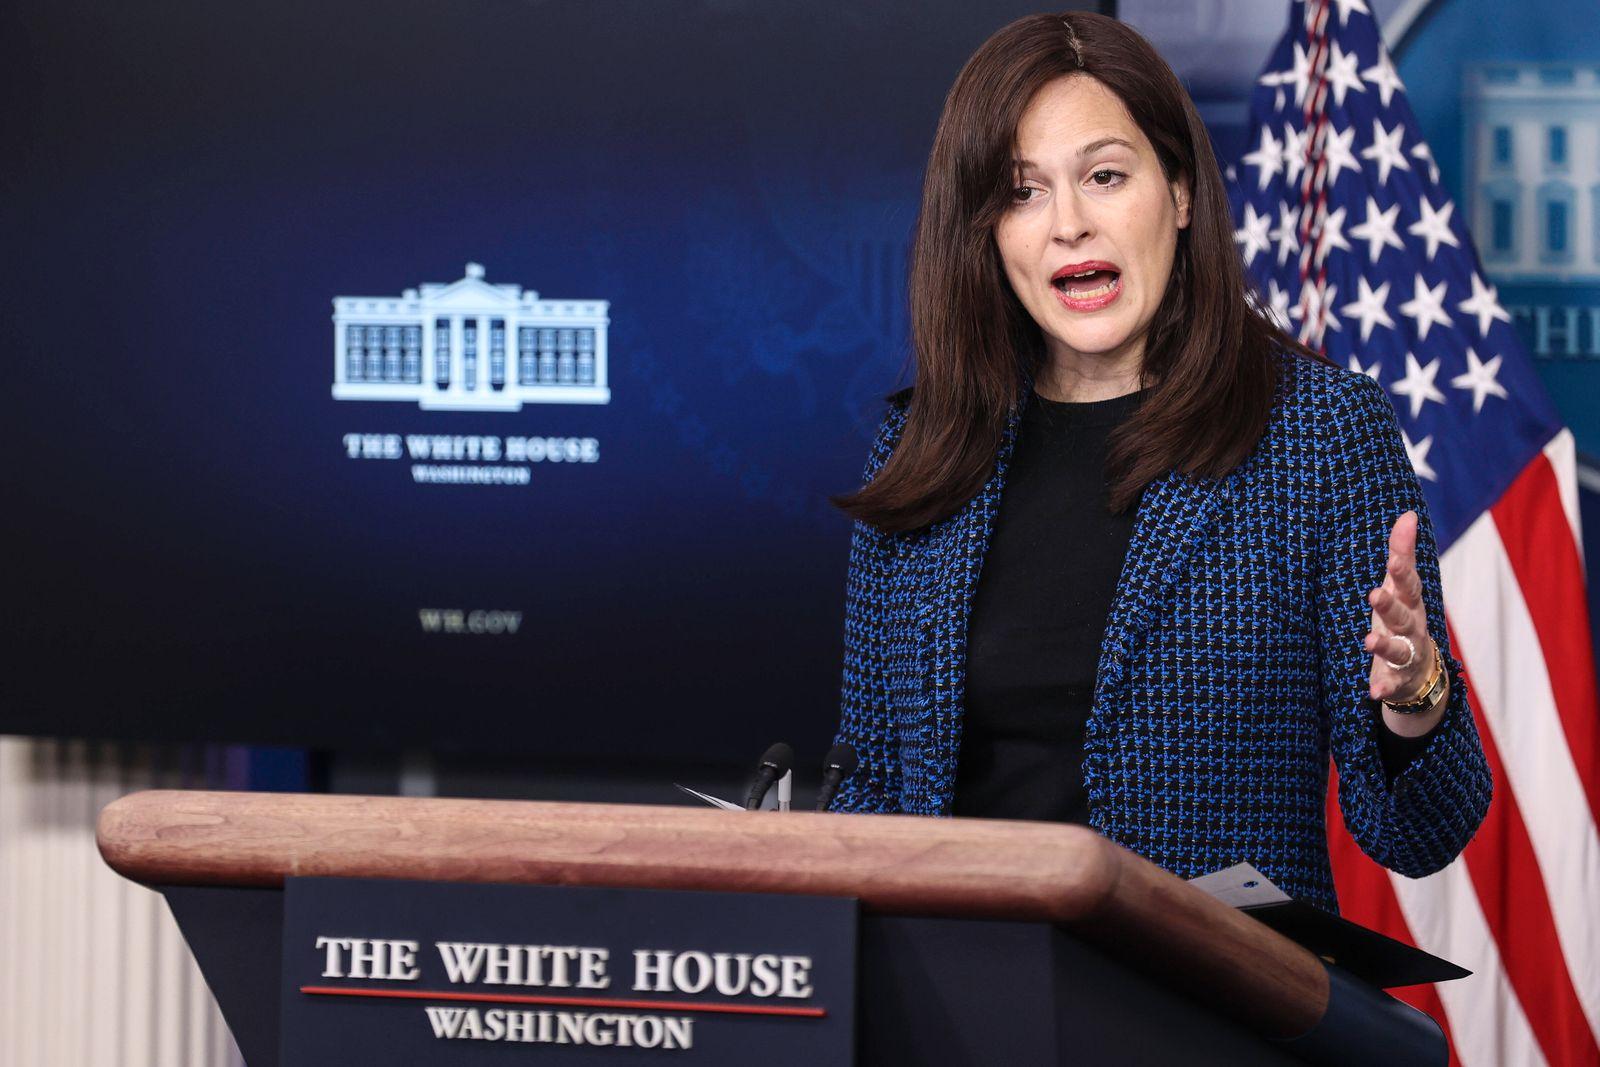 February 17, 2021, Washington, District of Columbia, USA: White House deputy national security adviser Anne Neuberger s